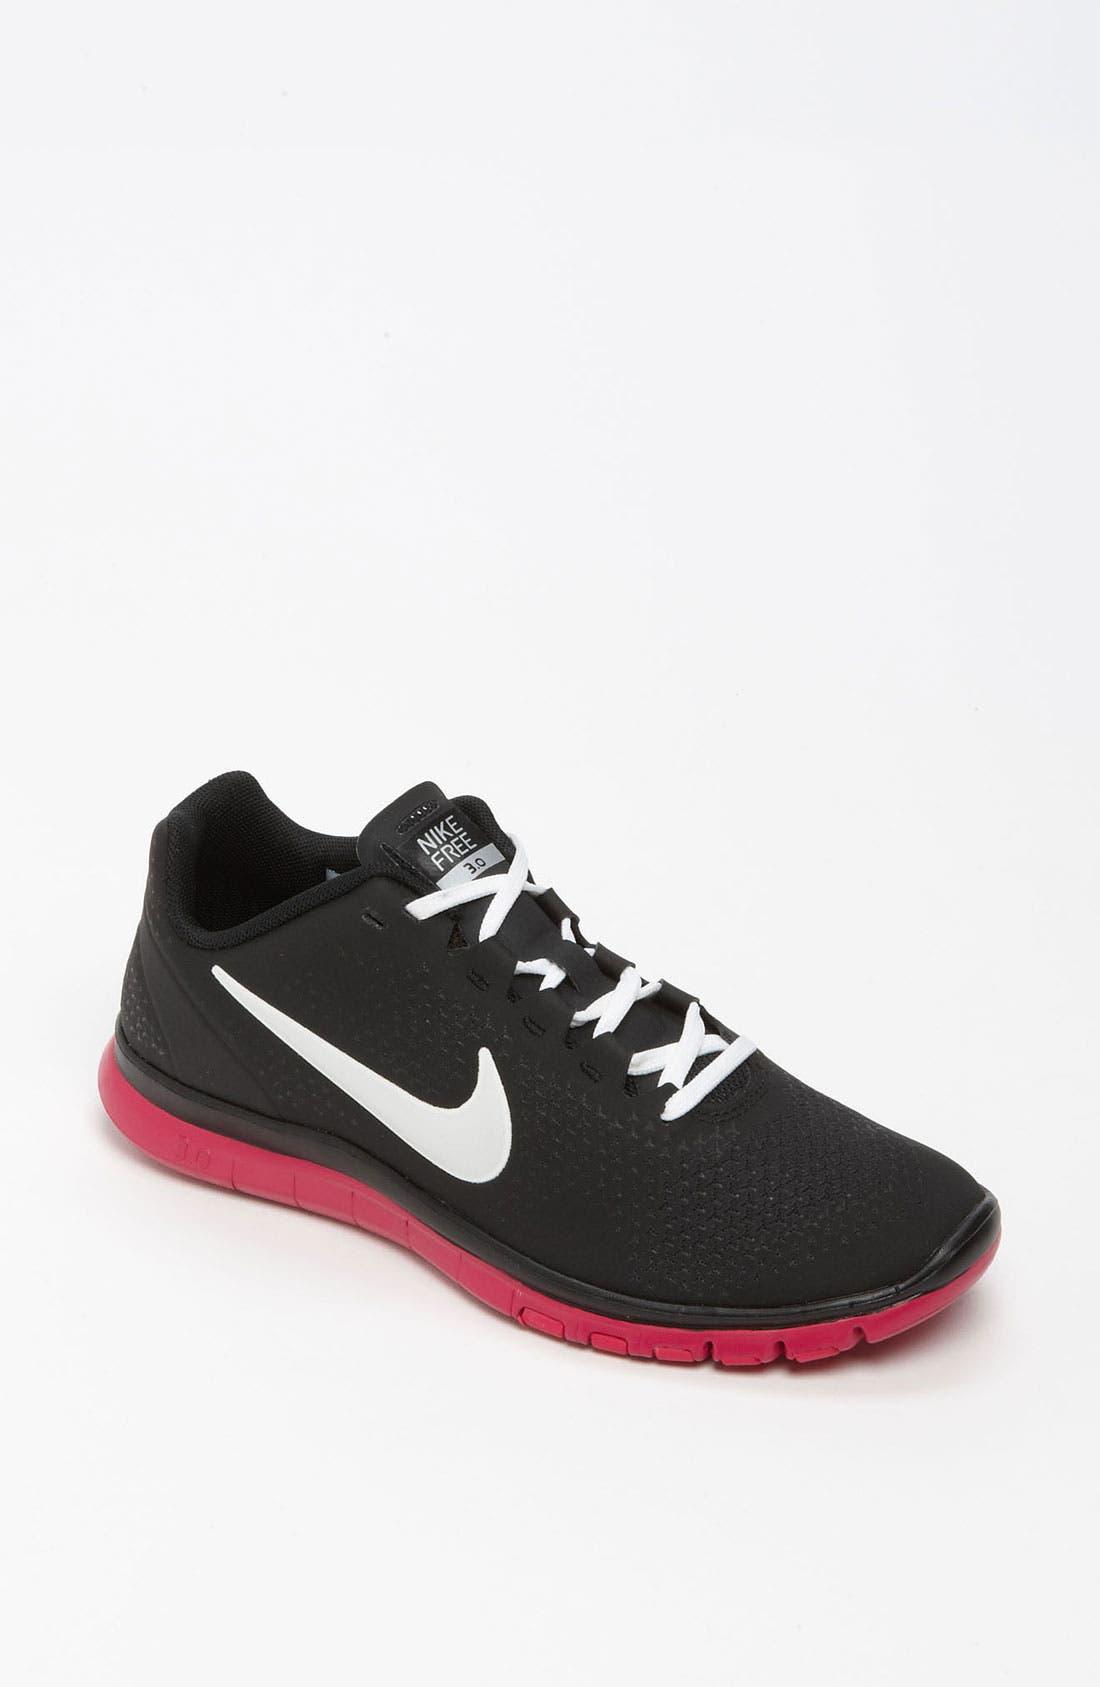 Main Image - Nike 'Free Advantage' Training Shoe (Women)